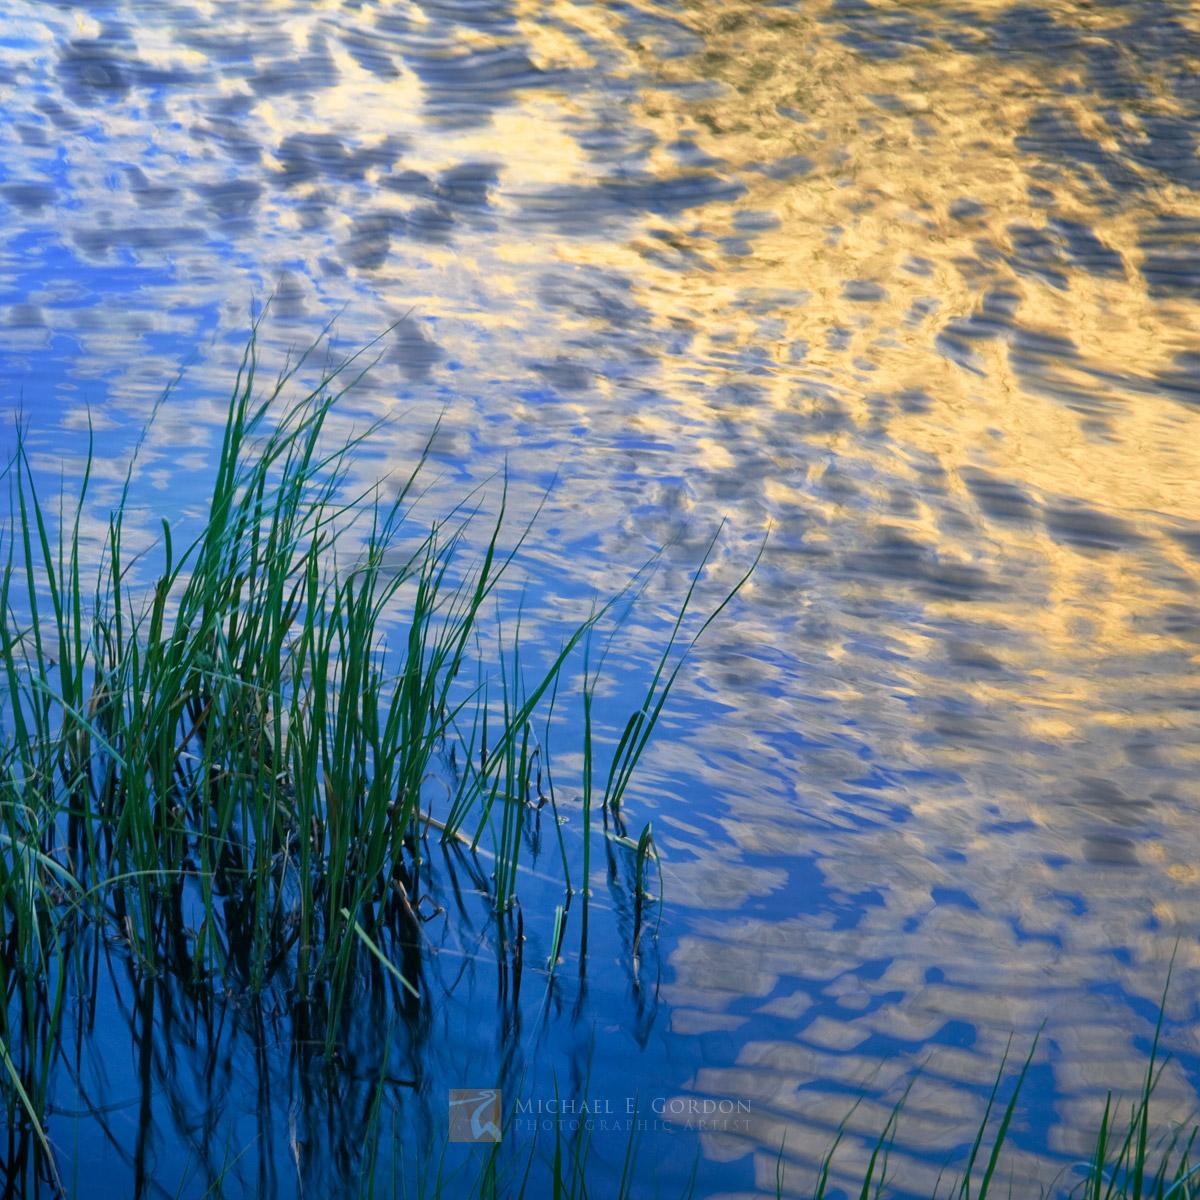 golden, High Sierra, Sierra Nevada, granite, sunrise, reflects, wind, rippled, pond, Bishop Creek Canyon, photo